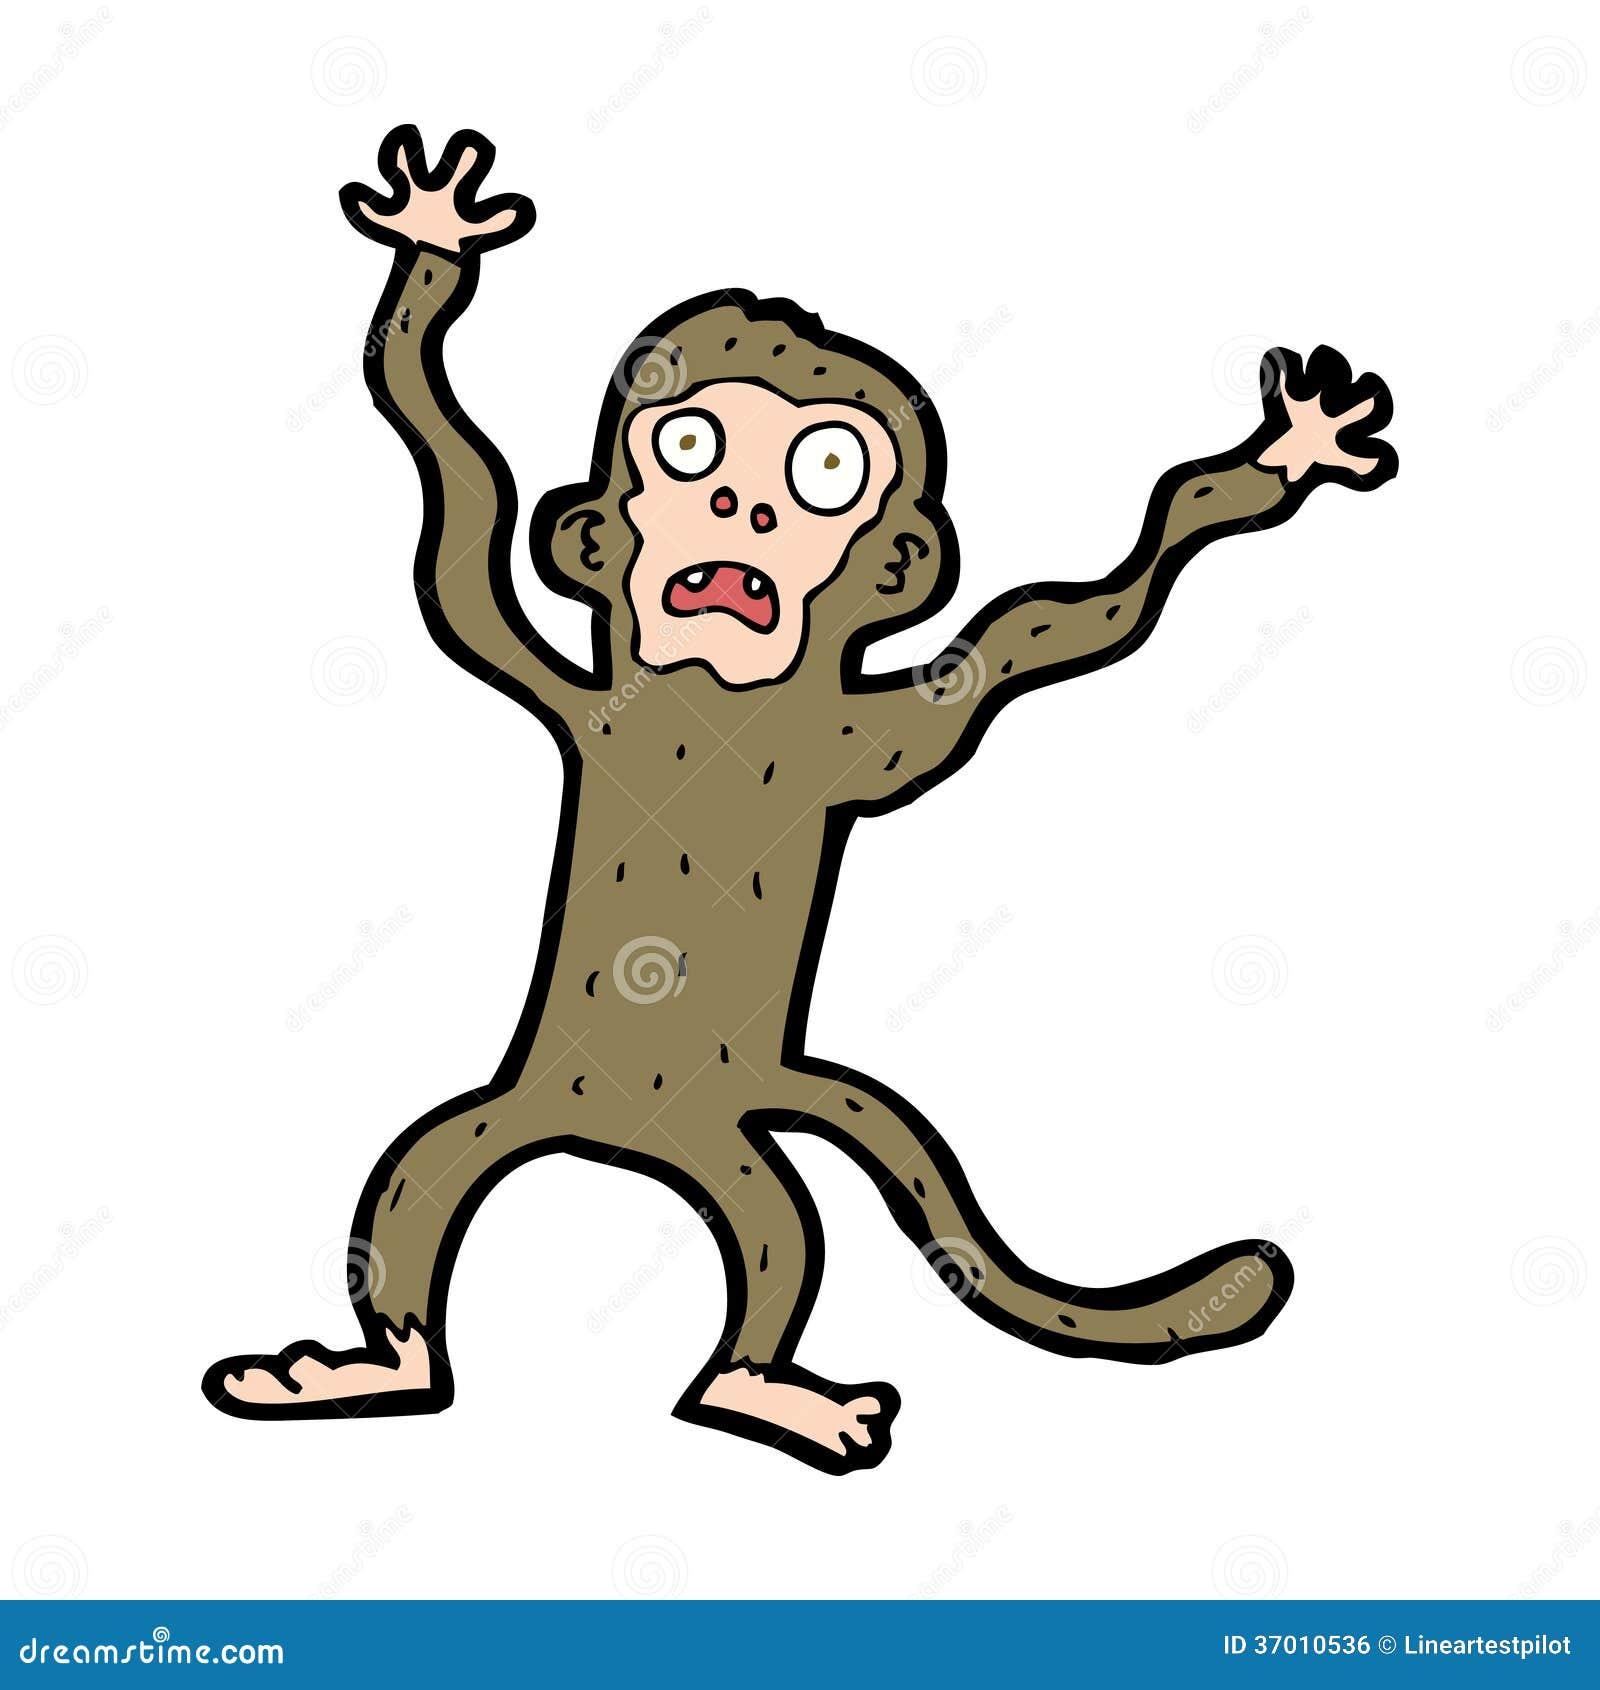 Cartoon Monkeys Gallery 6  |Scared Monkey Animation